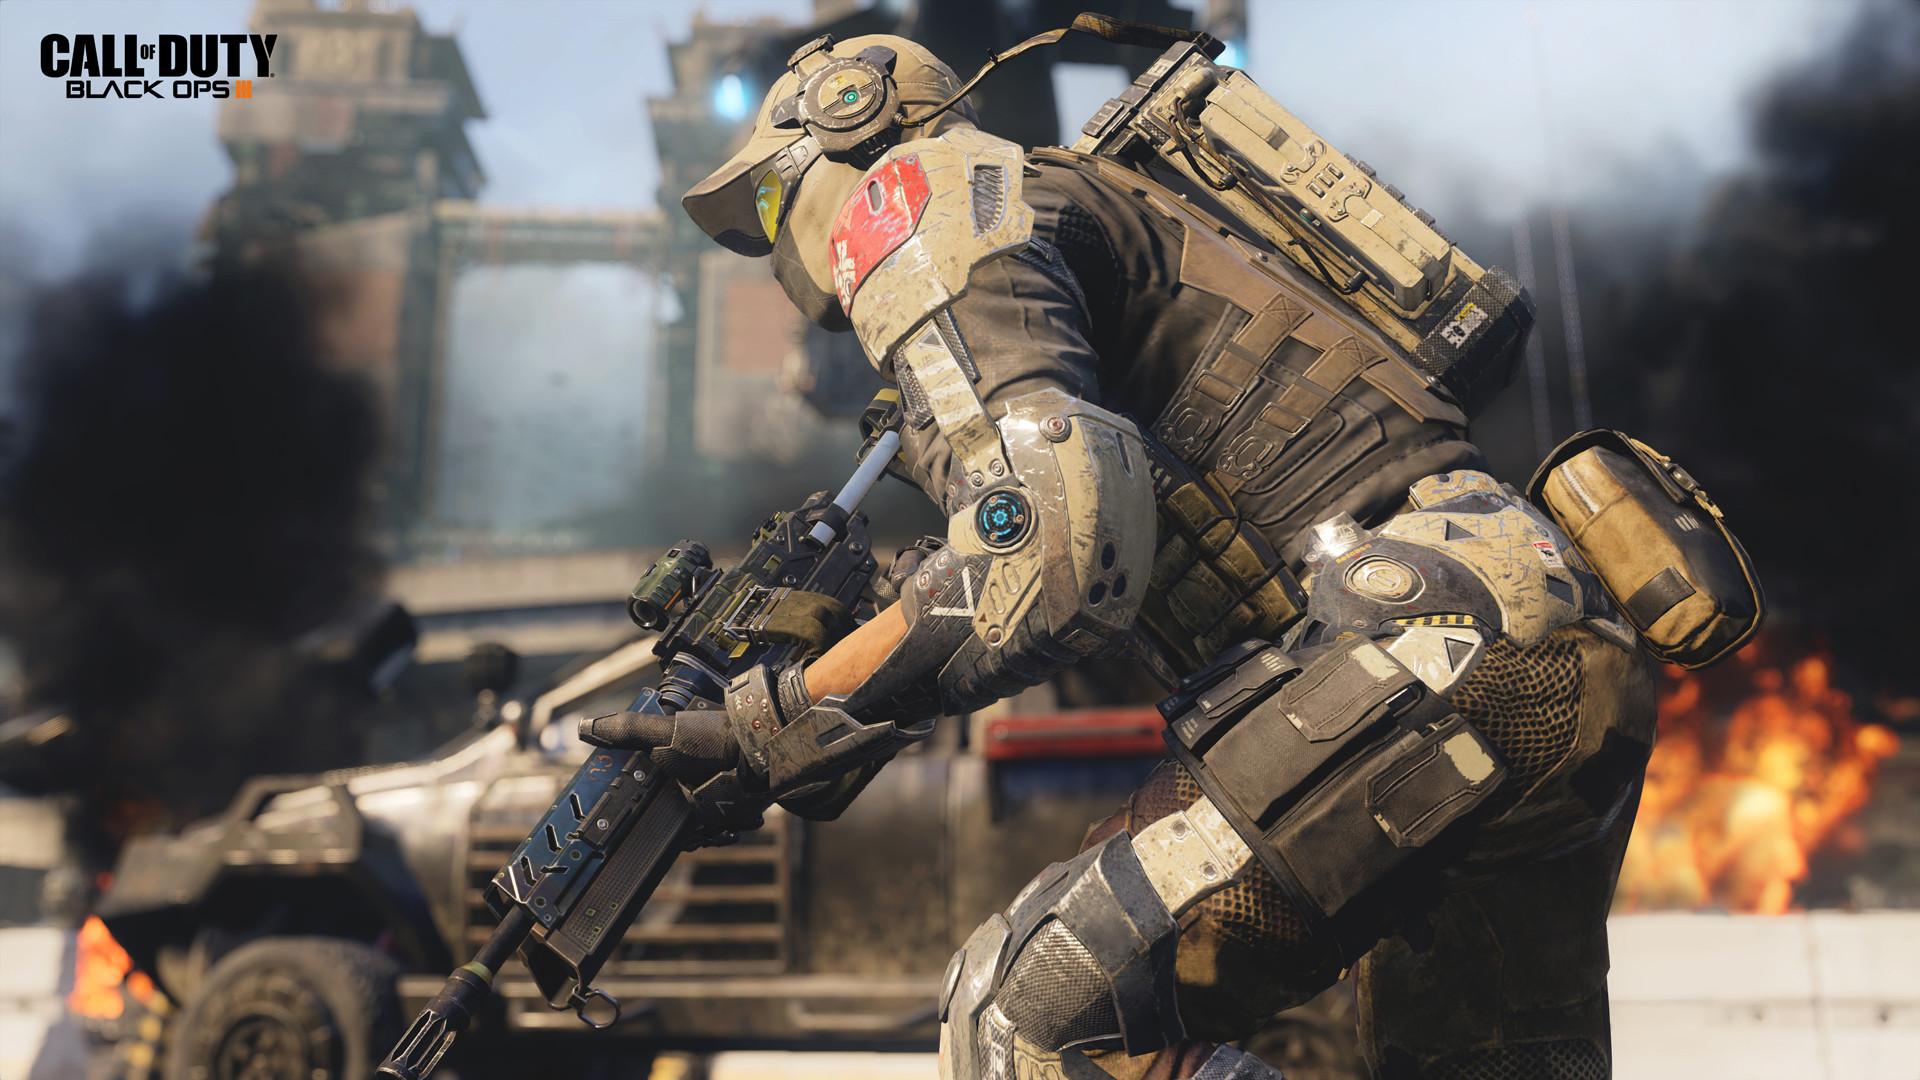 Call of Duty Black Ops III on Steam